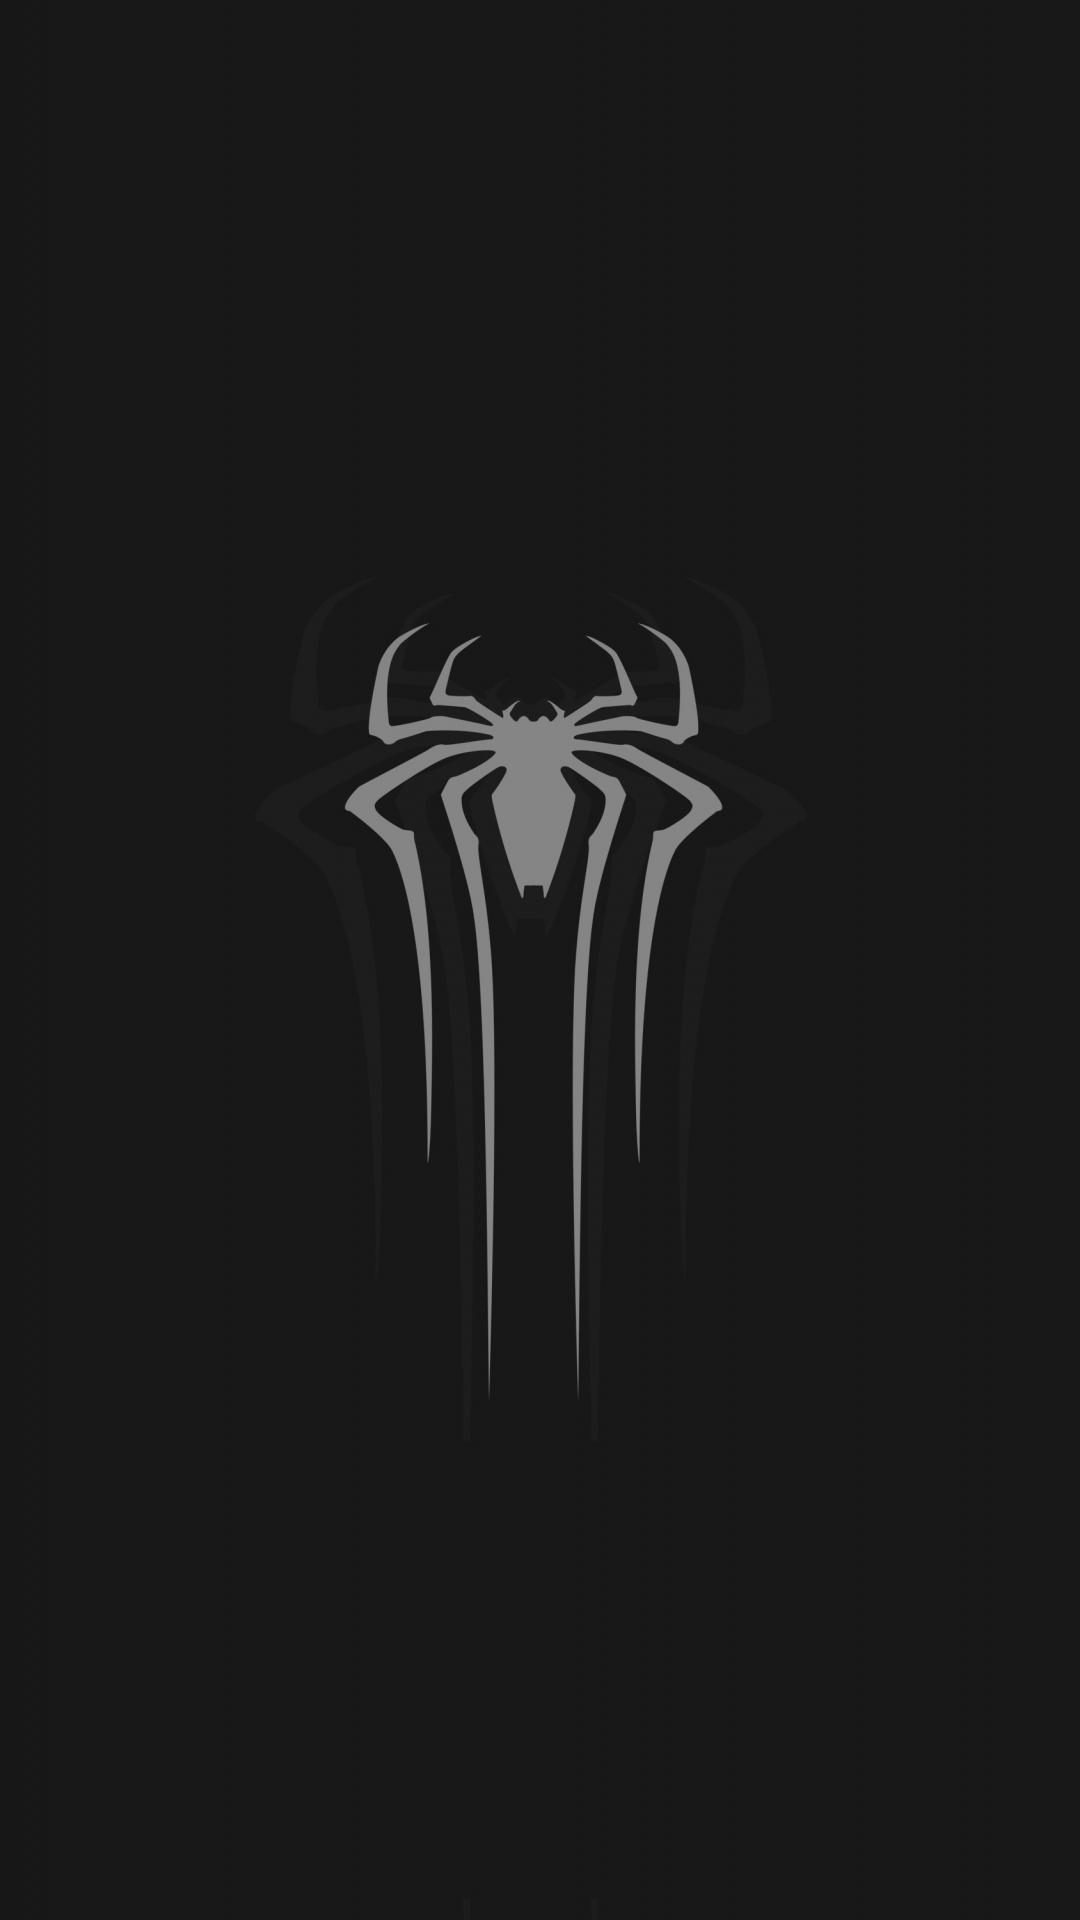 Download 1080x1920 Wallpaper Logo Gray Spider Man Minimal Dark